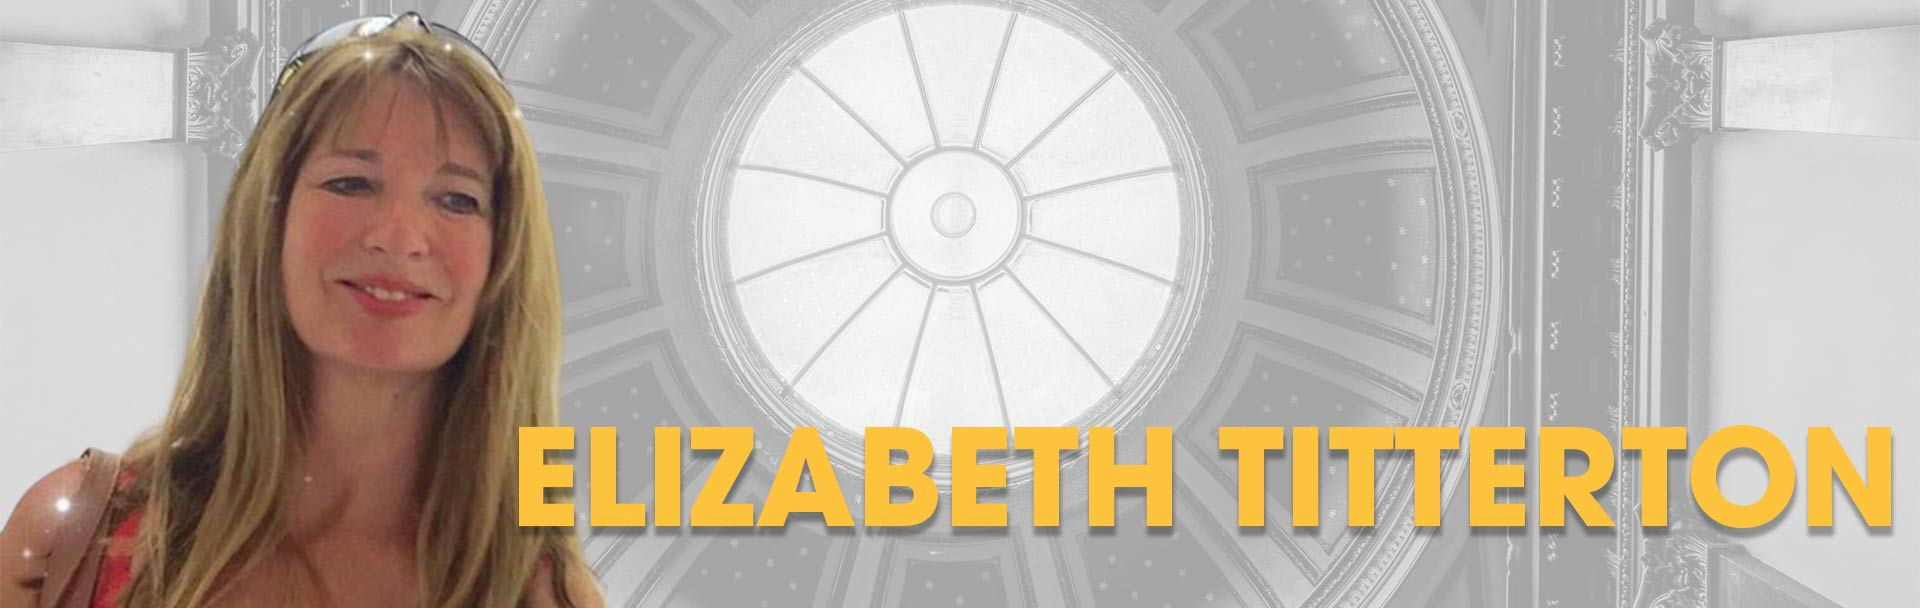 Elizabeth Titterton is part of Saturday Night Demonstrations of Mediumship at the Sir Arthur Conan Doyle Centre